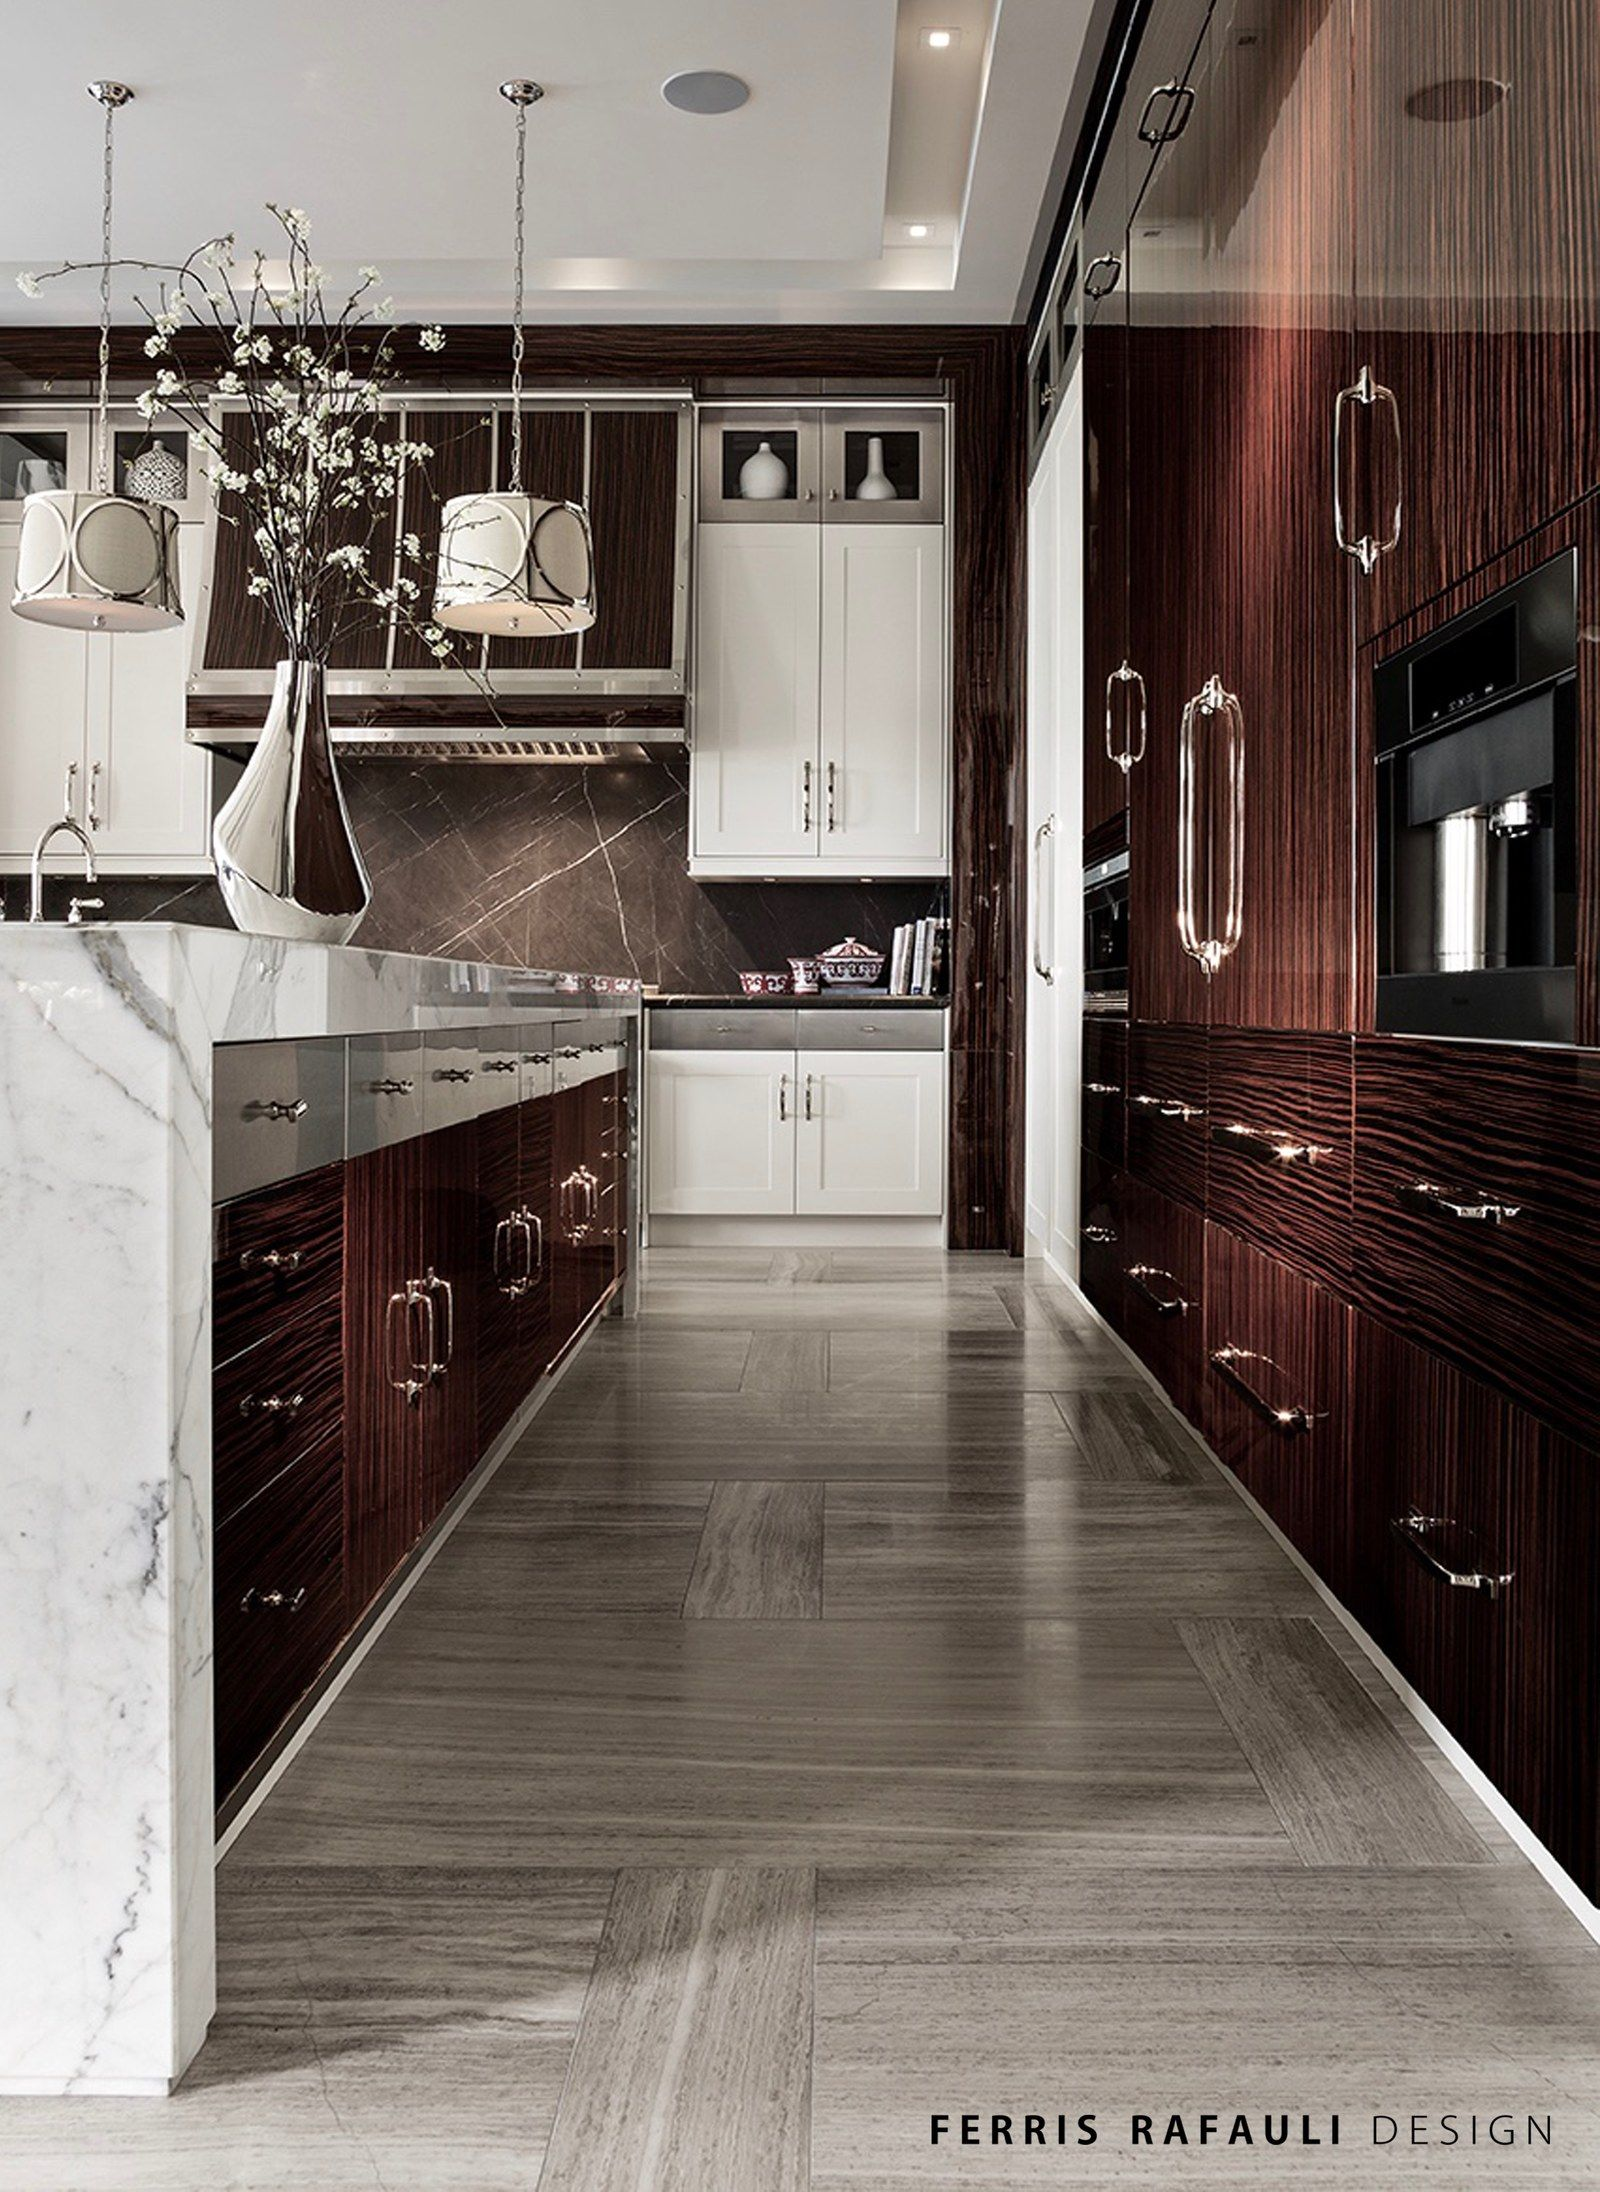 ferris rafauli architecture by ferris rafauli modern kitchen design contemporary kitchen on l kitchen interior modern id=28191